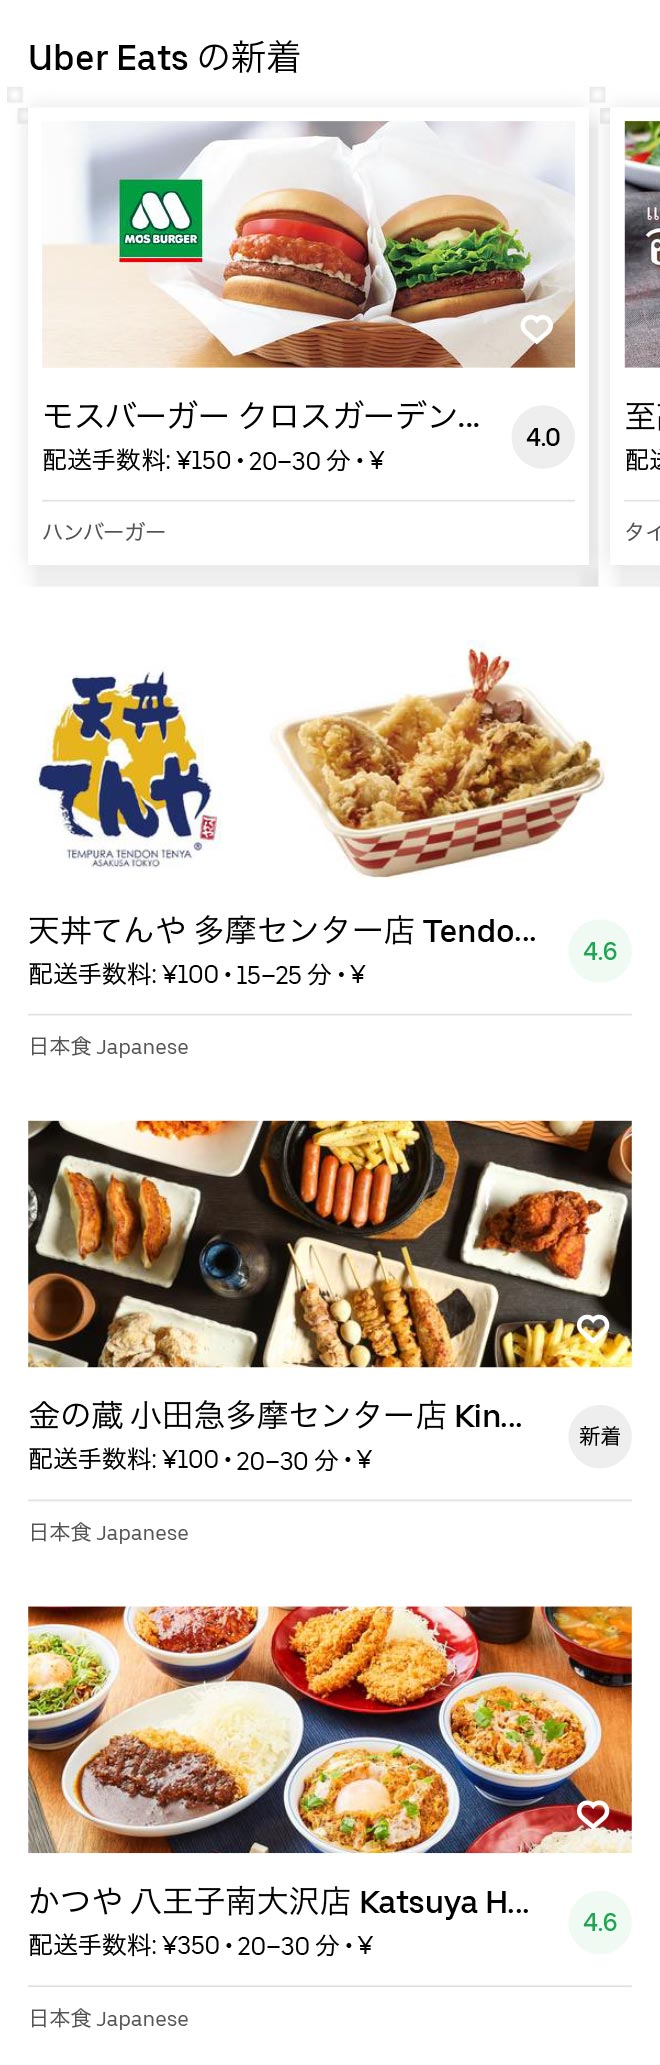 Tama center menu 2007 07